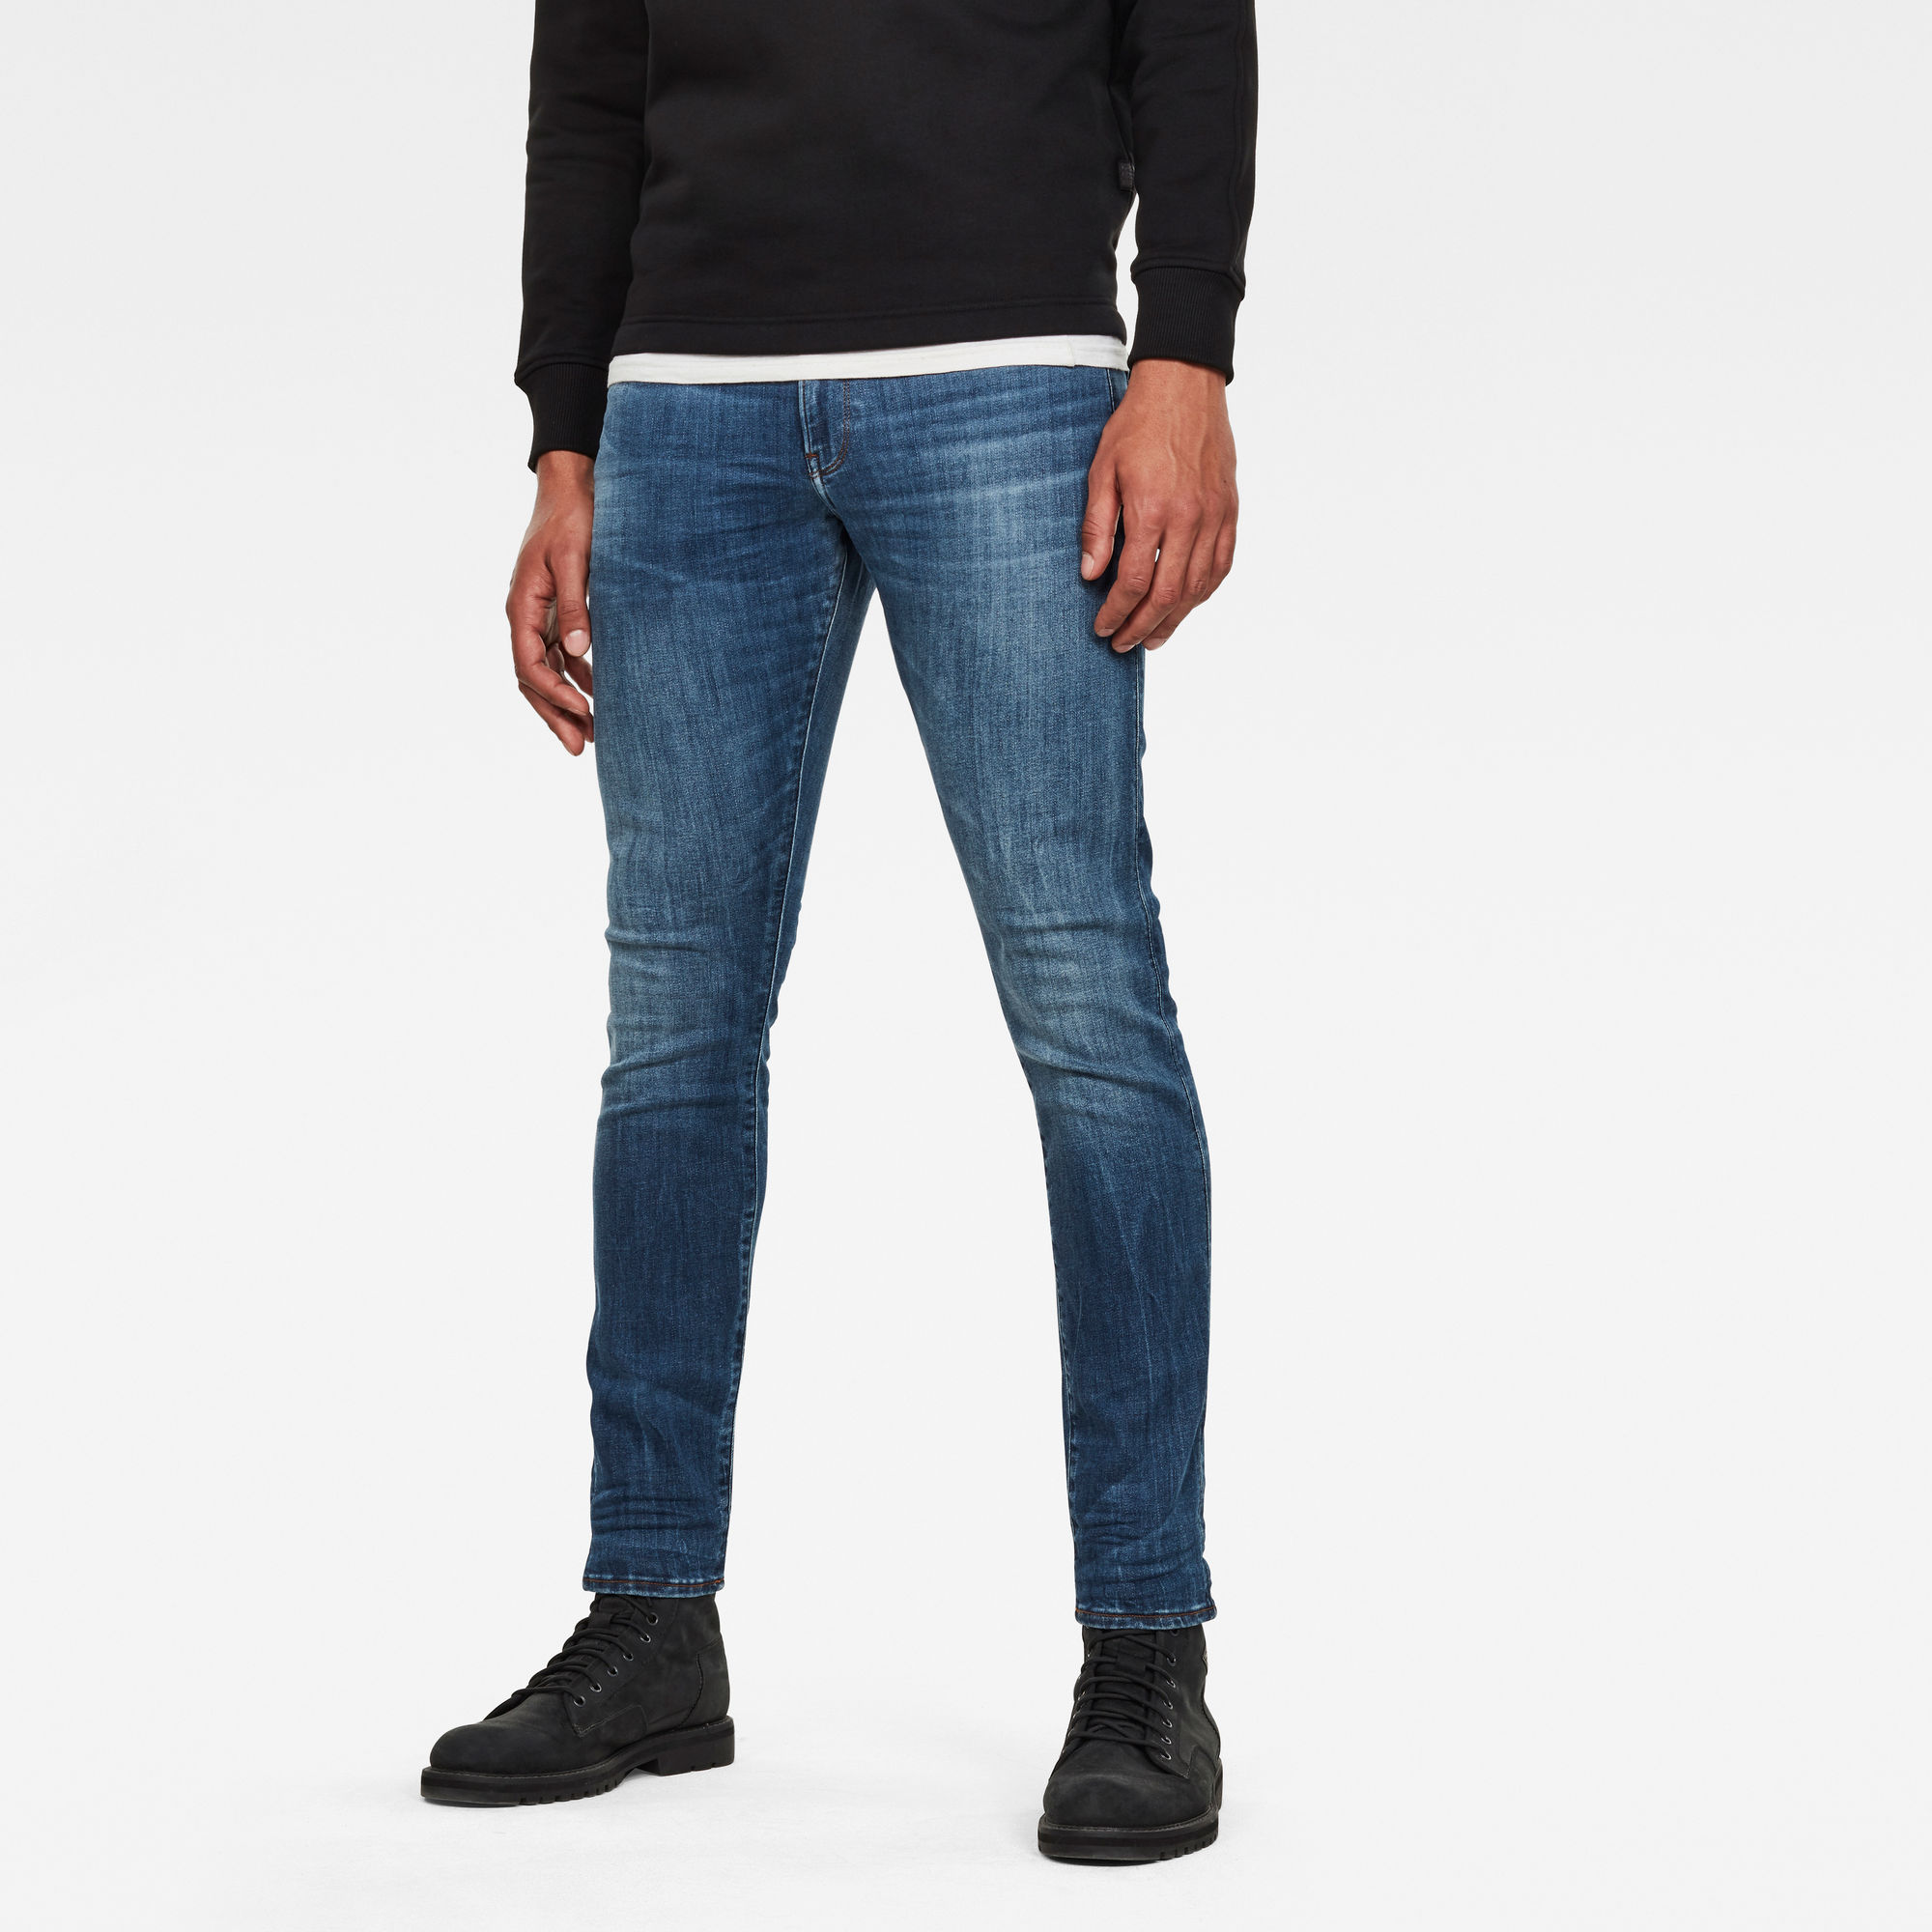 G-Star RAW Heren 3301 Deconstructed Skinny Jeans Blauw